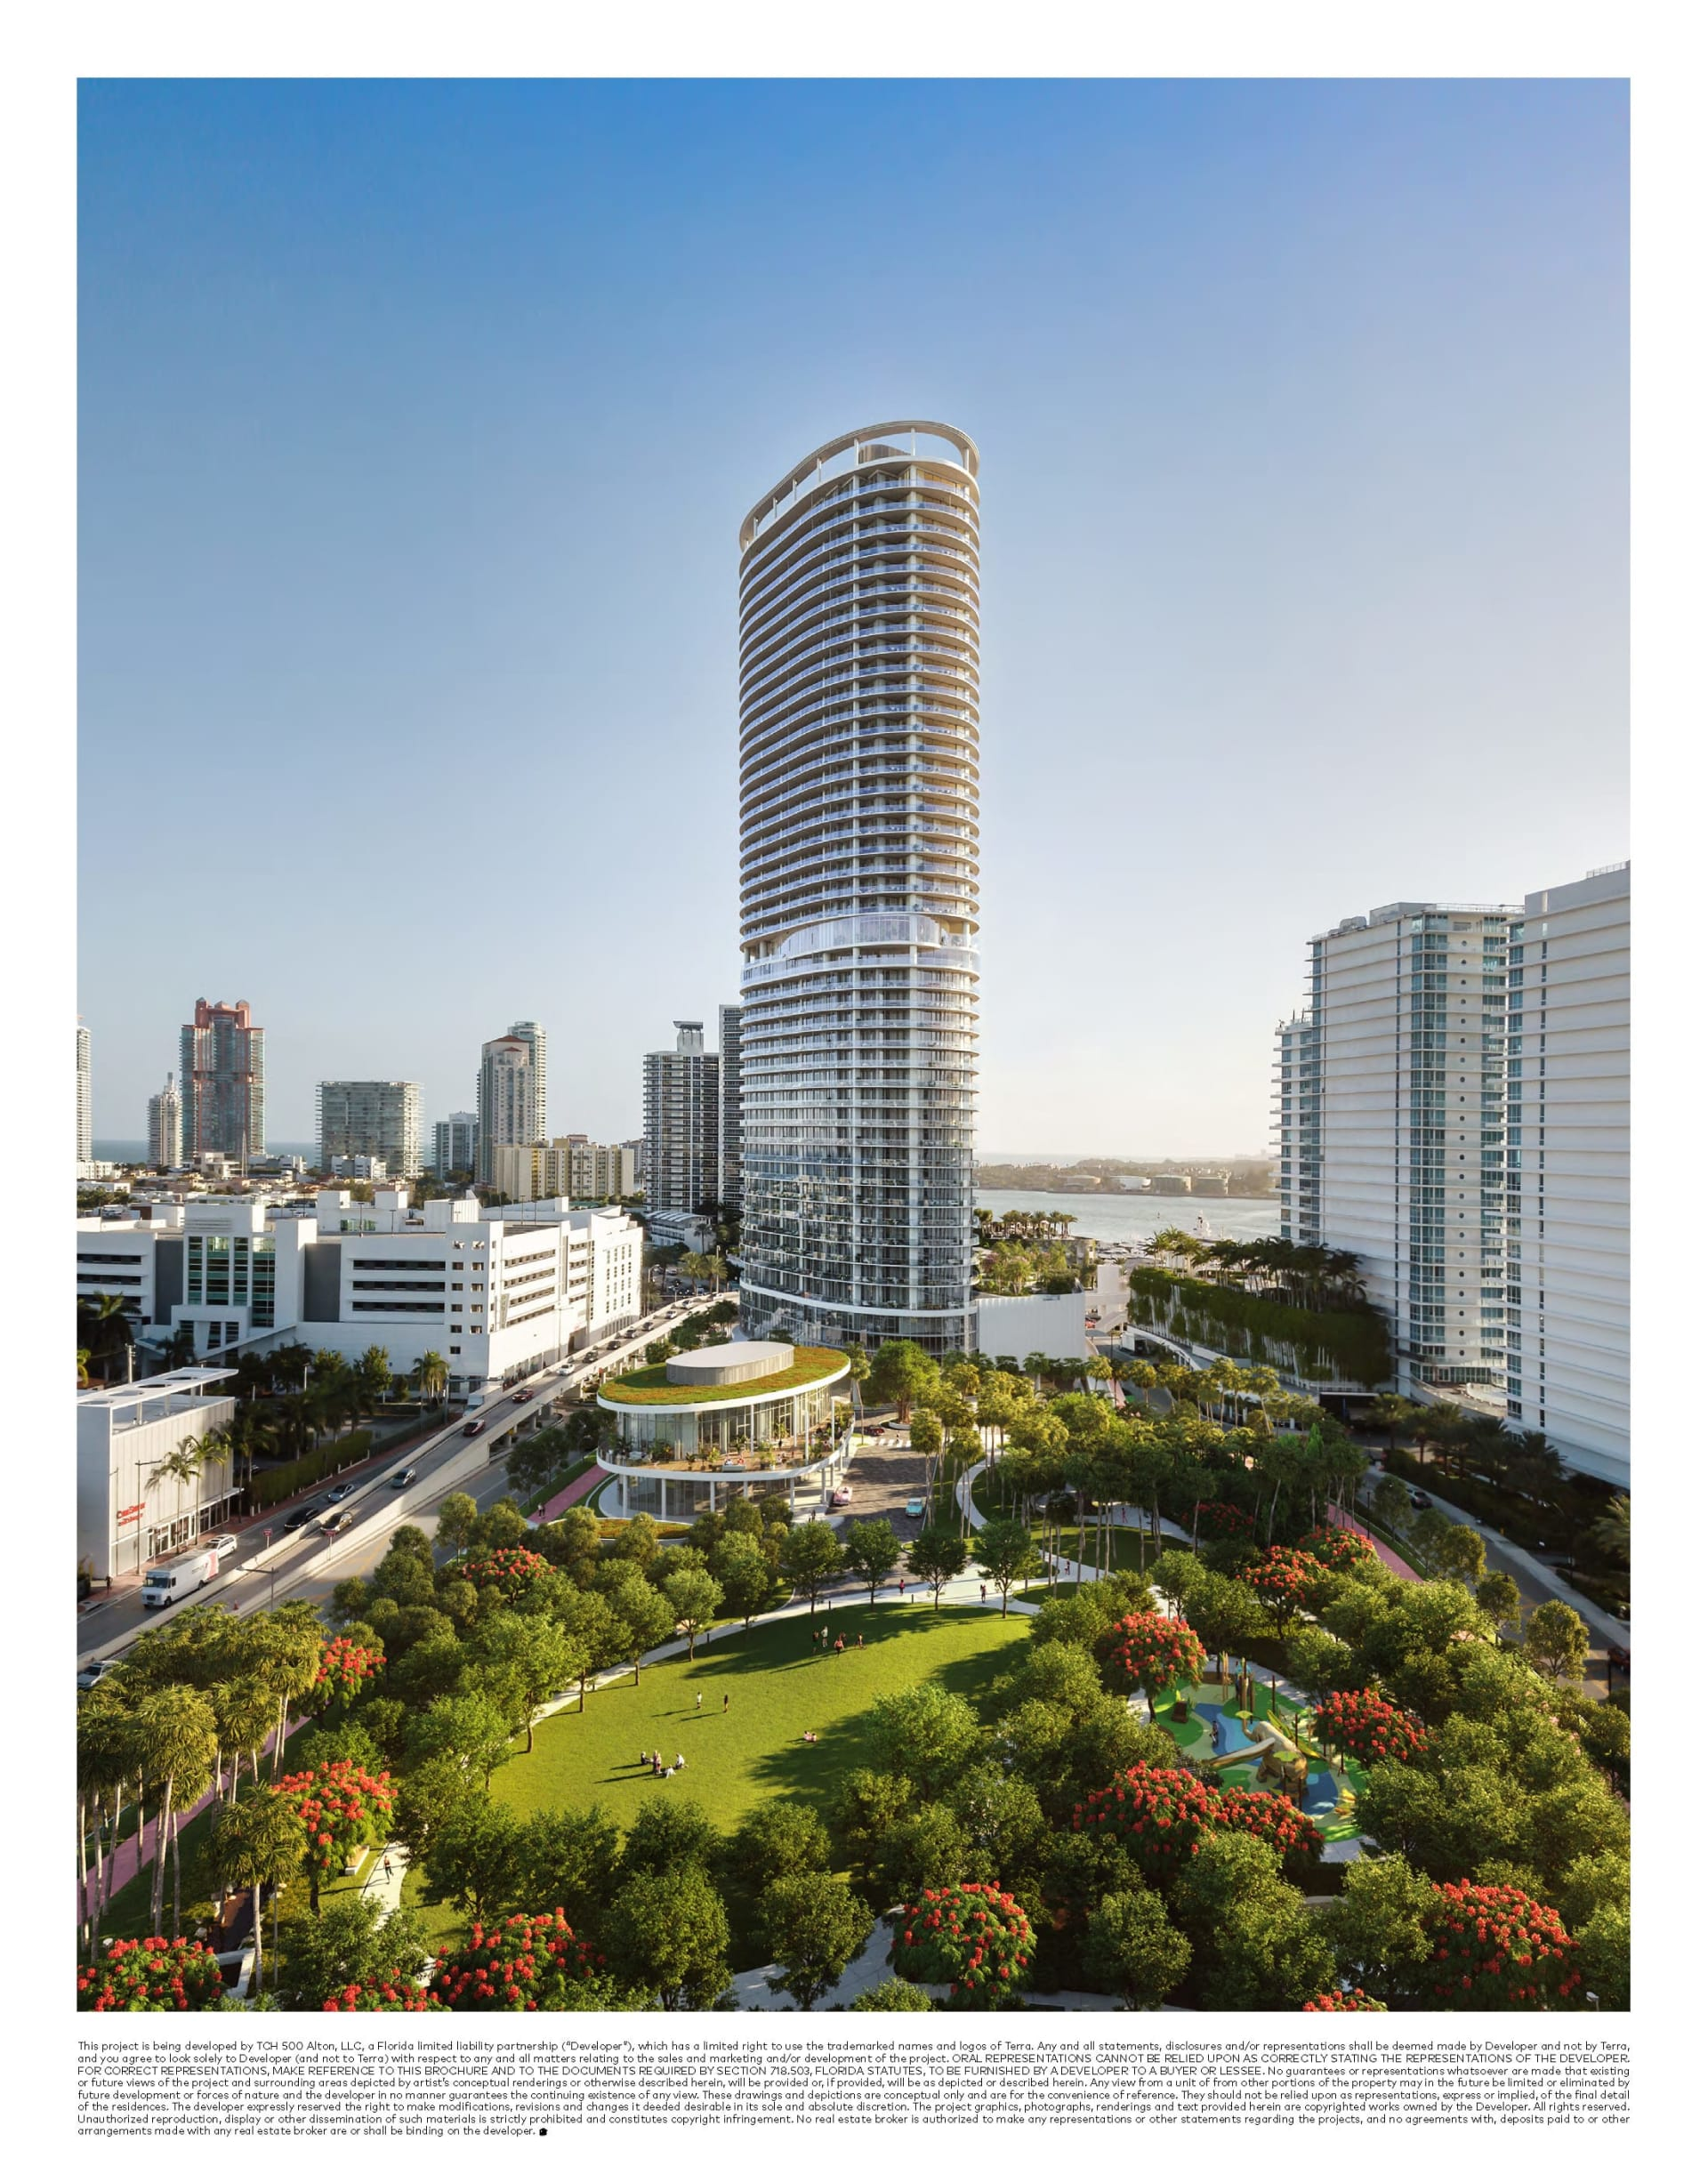 Five Park Miami Beach